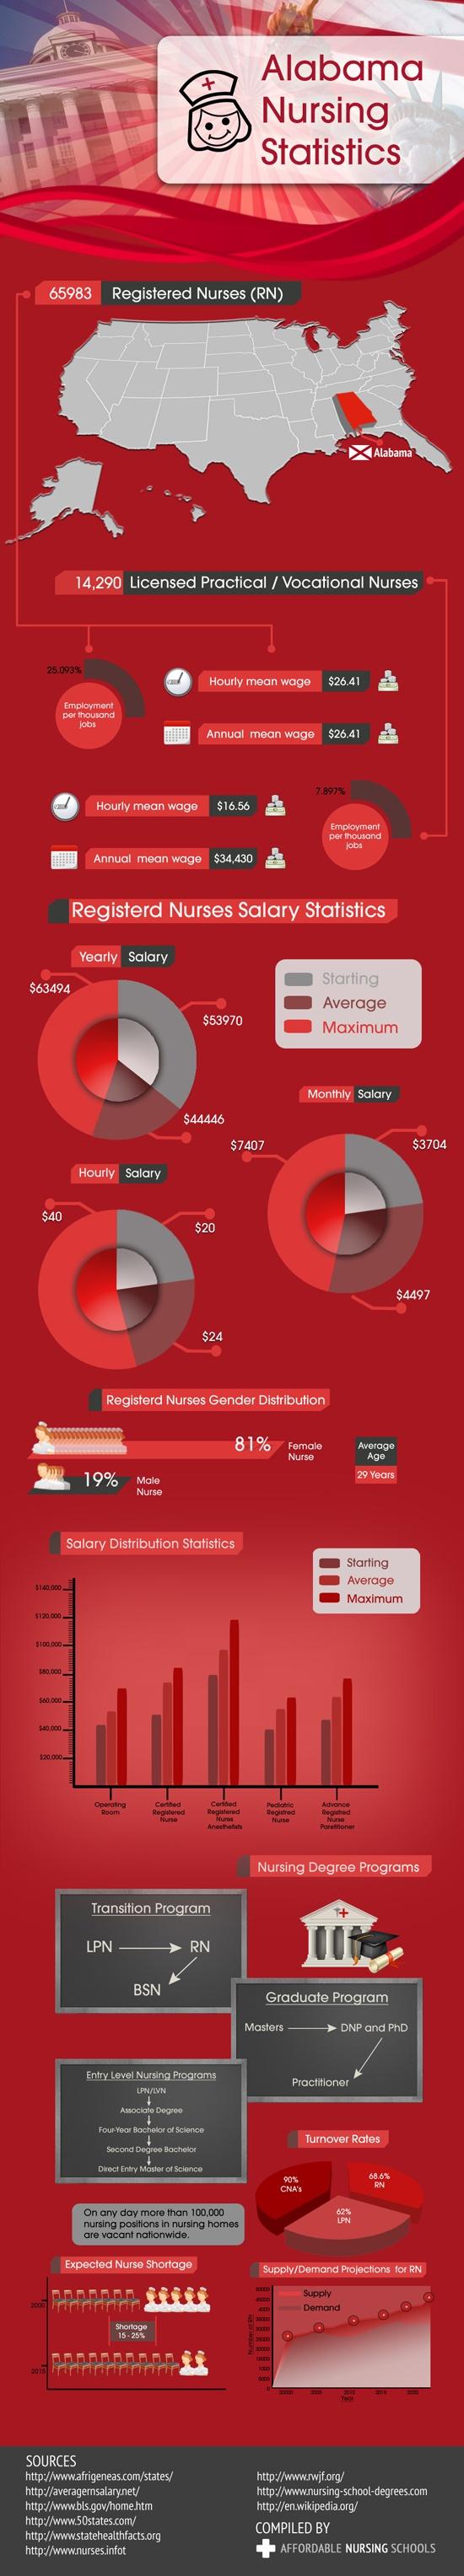 my path to a nursing career essay